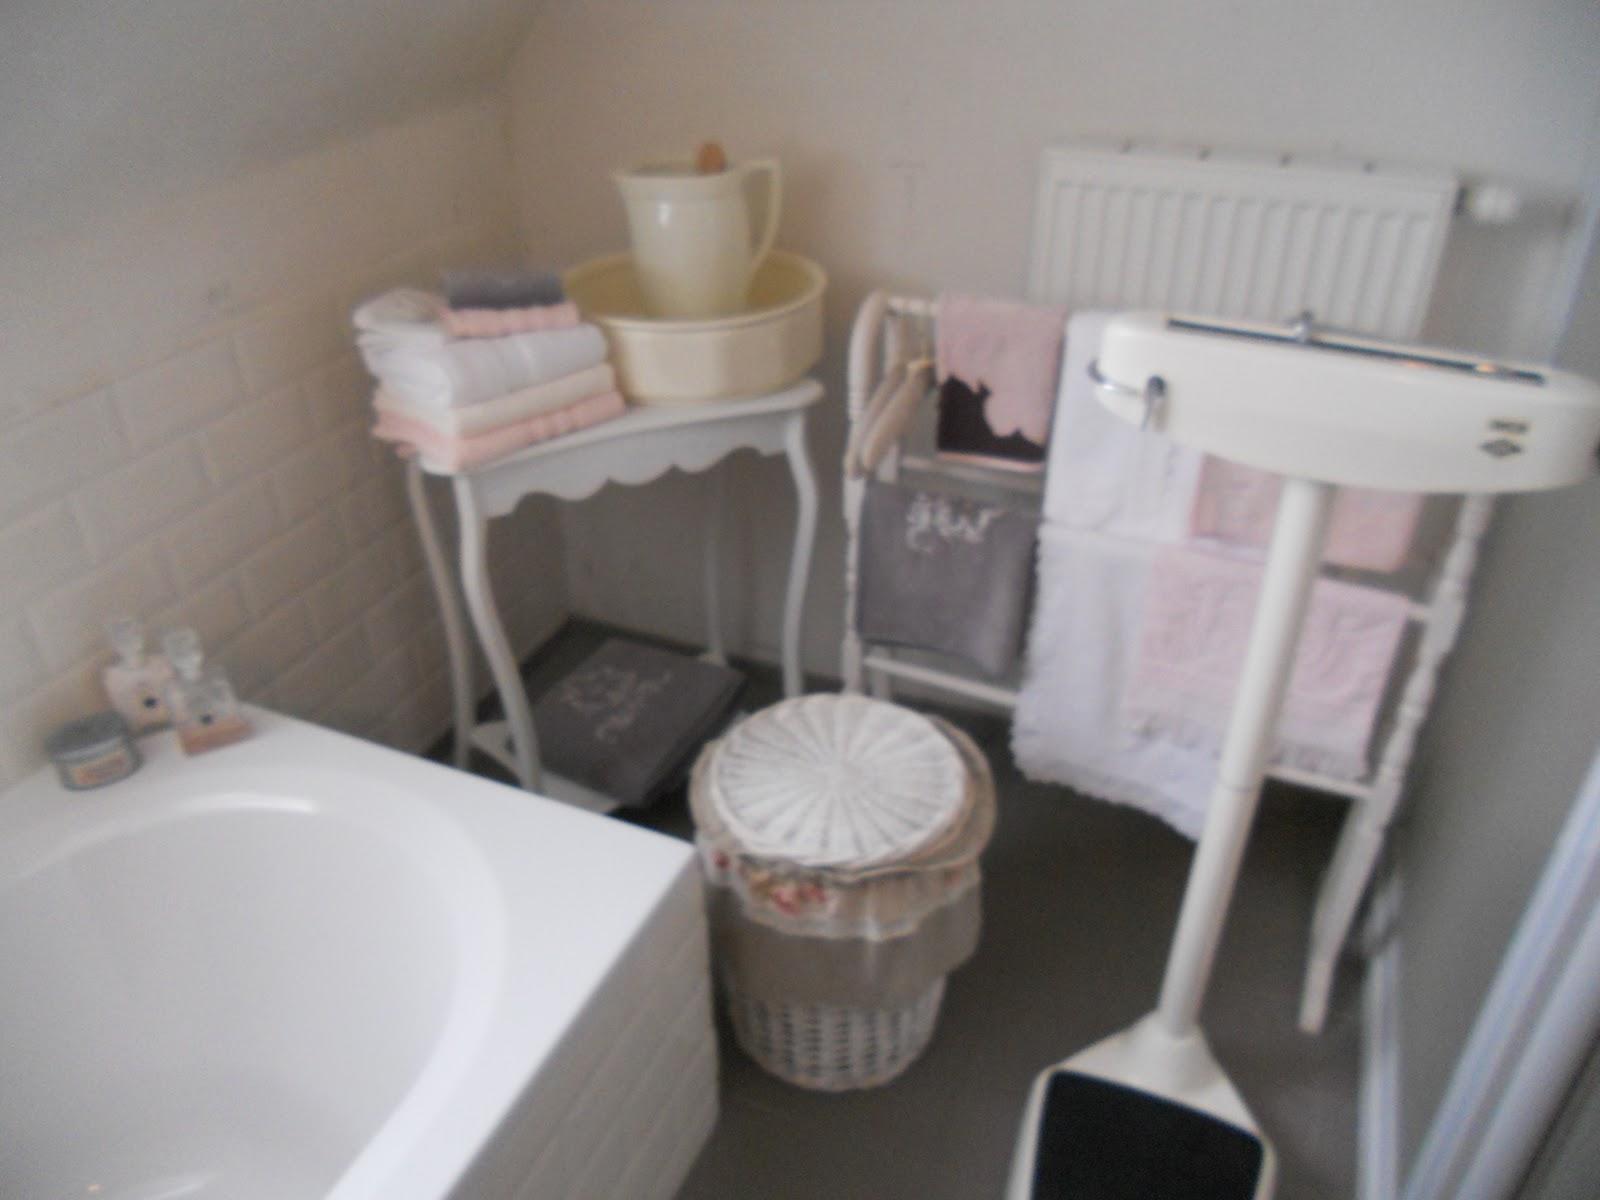 Maison marie et florence badkamer - Idee mozaieken badkamer ...